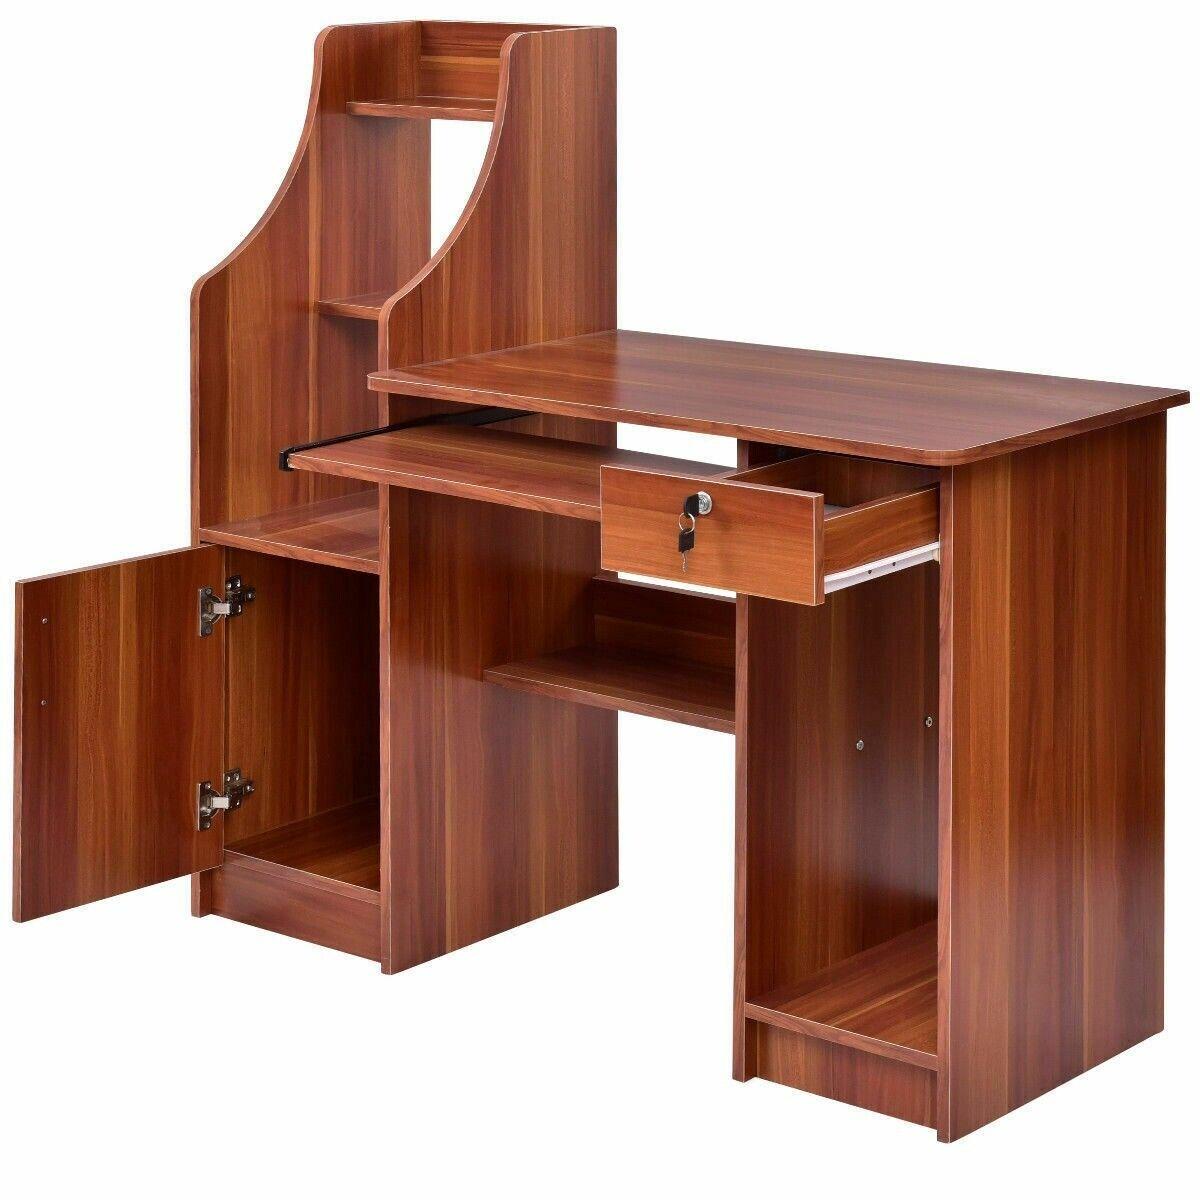 computer desk with drawers study table bookshelf